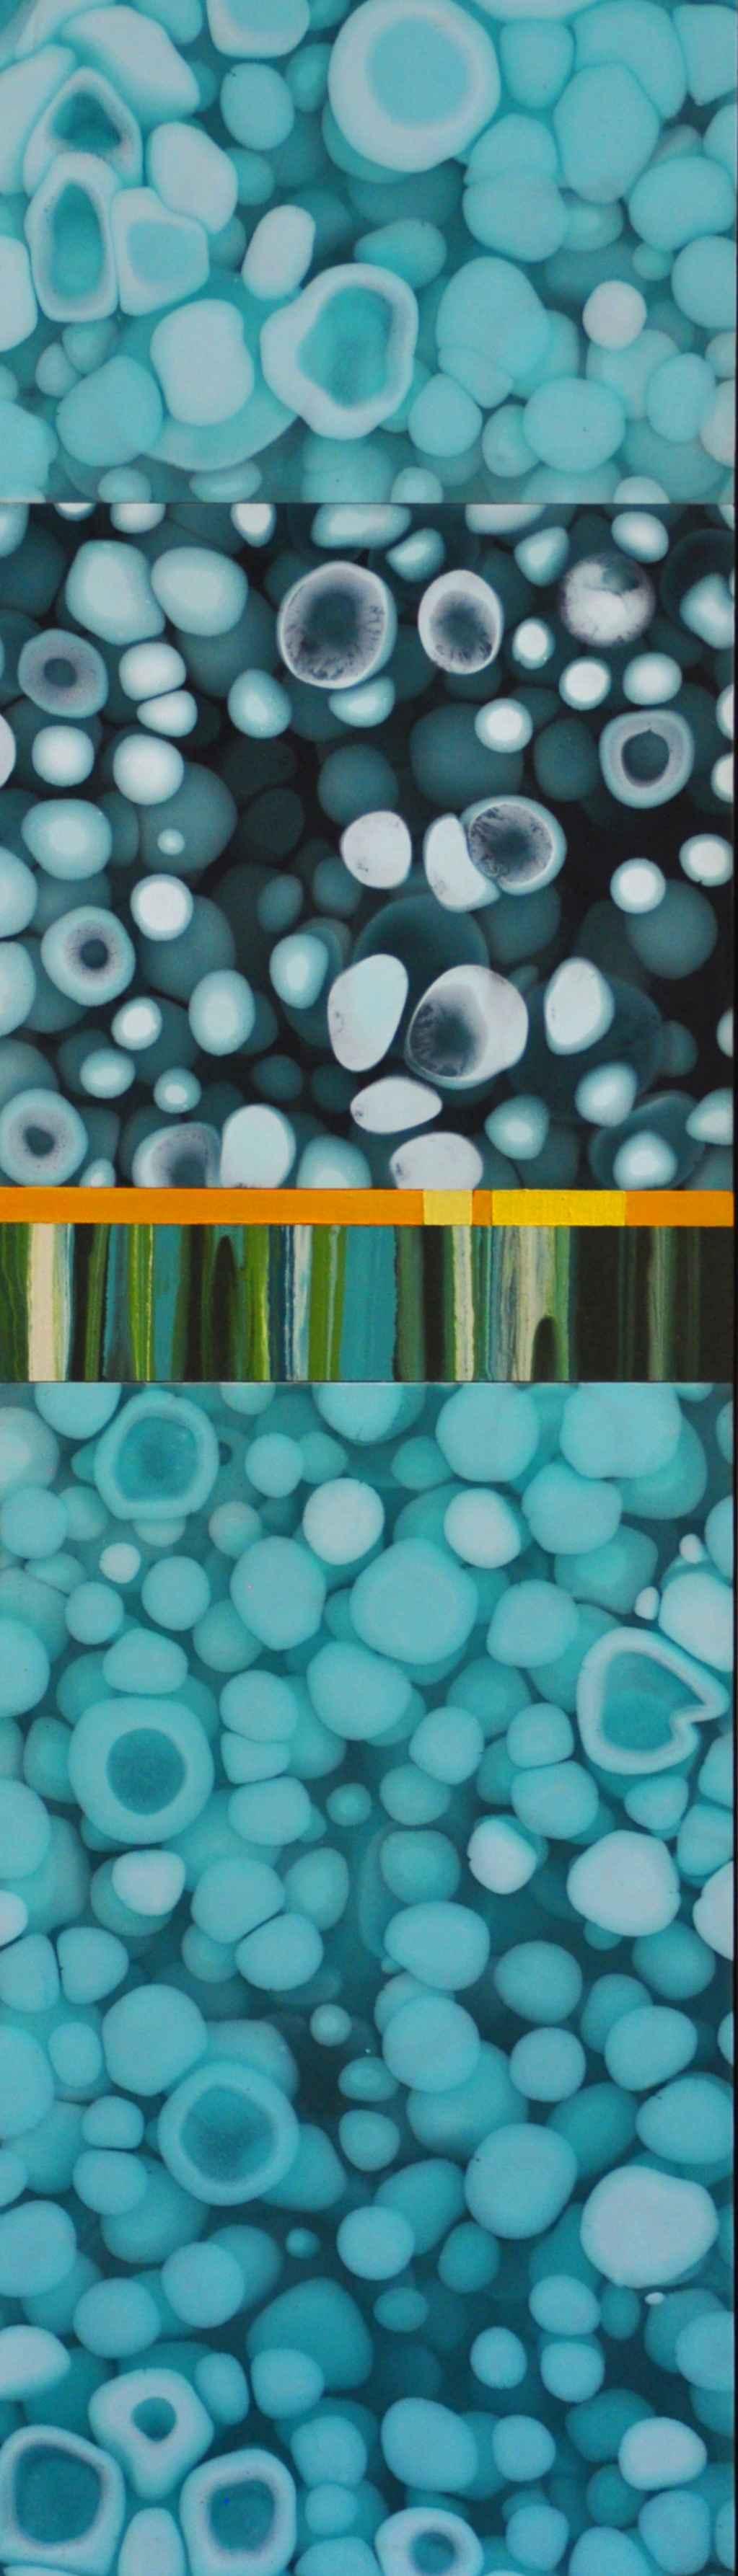 Small Slice #8 (Swimm... by  Susie White - Masterpiece Online